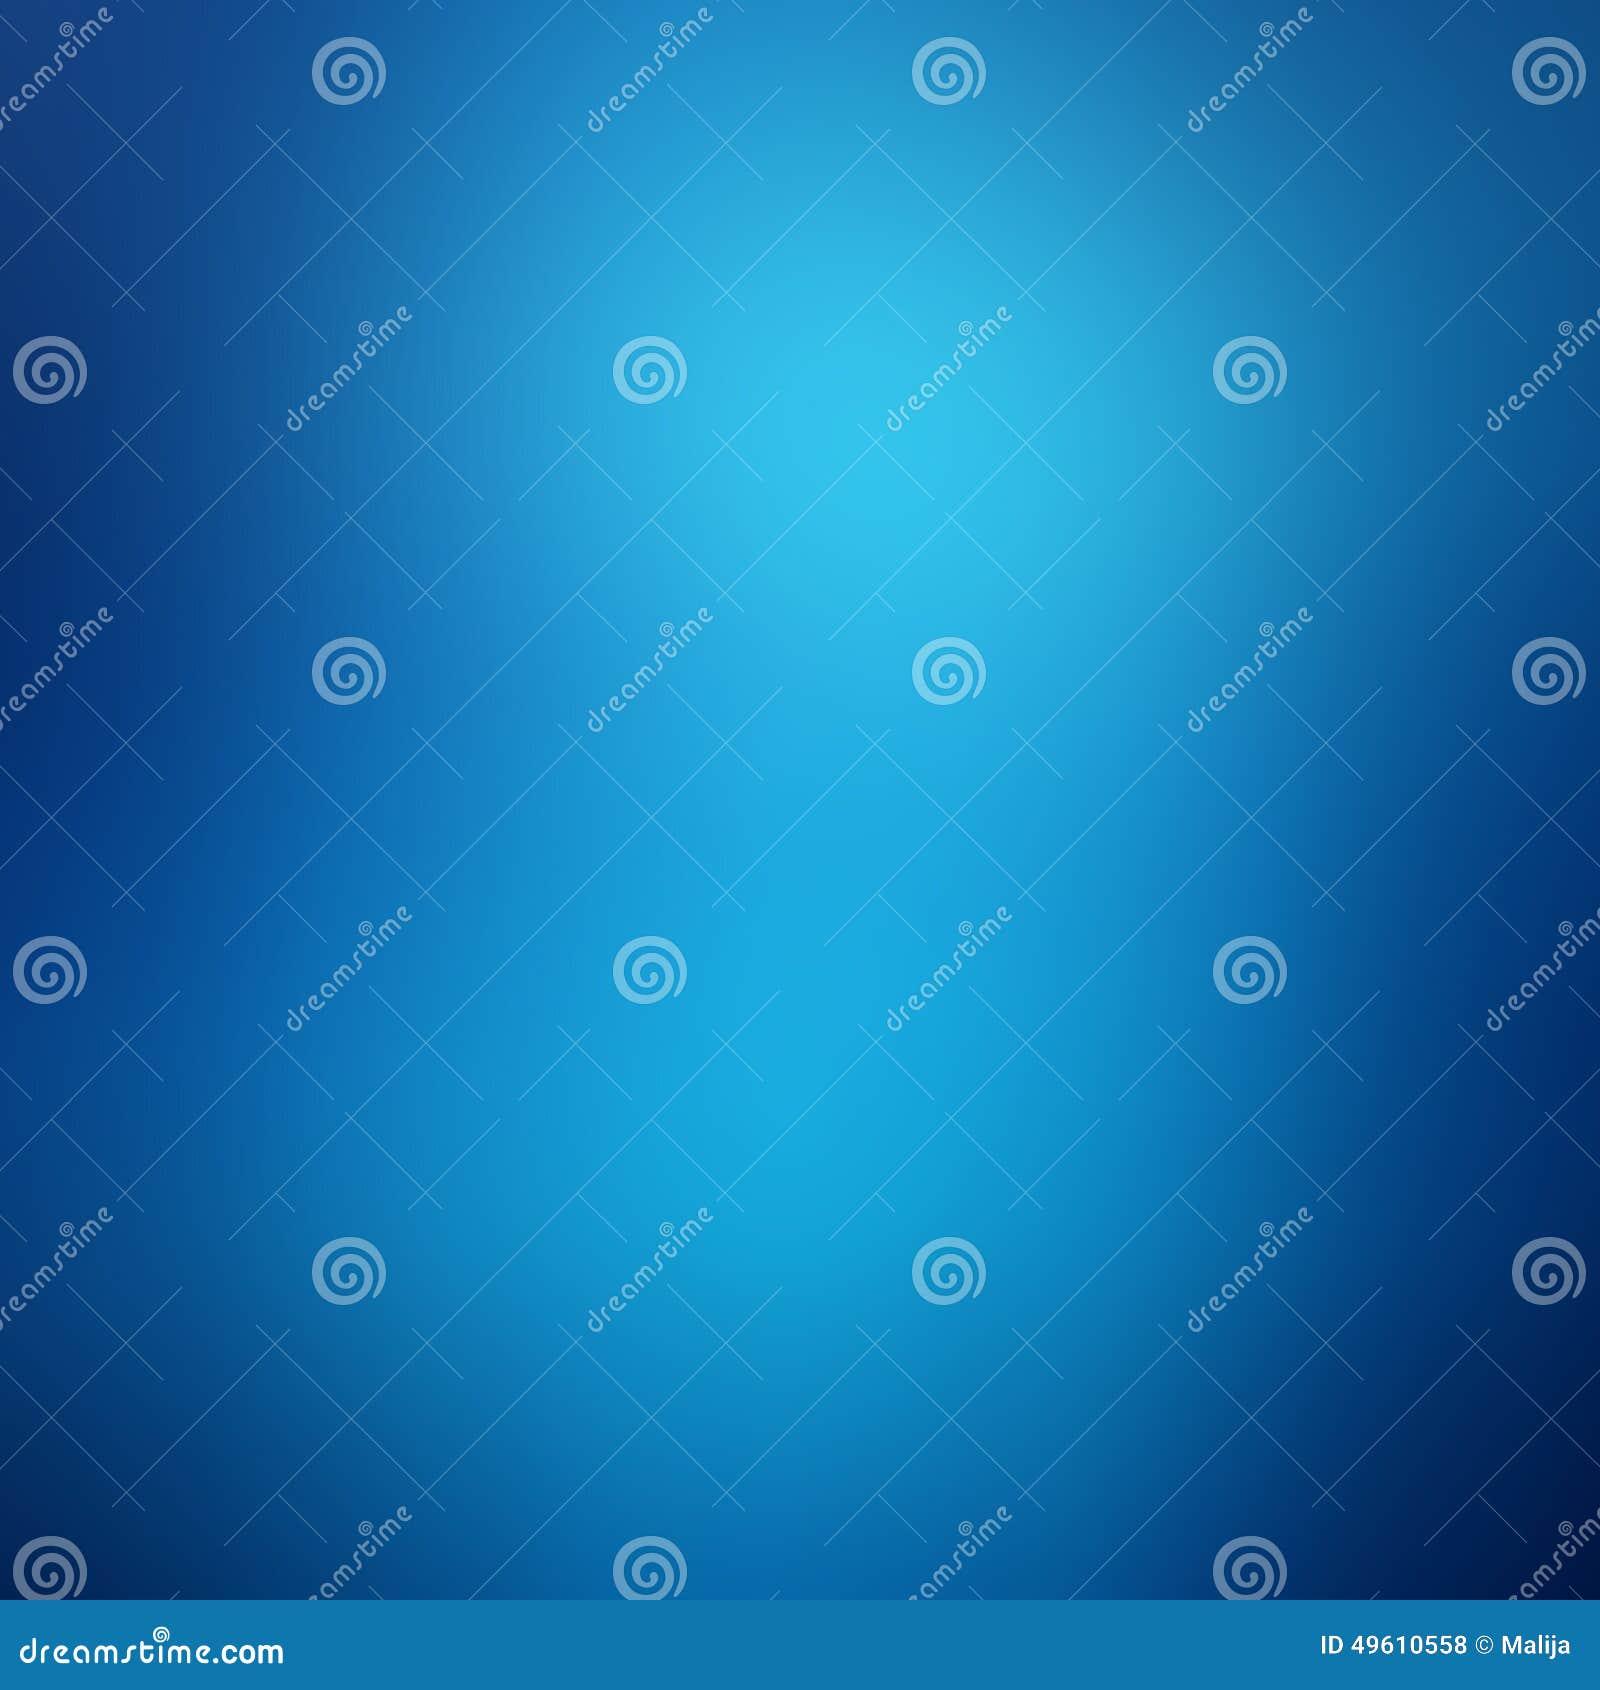 Light Blue Background Blurred Sky Design Stock Photo